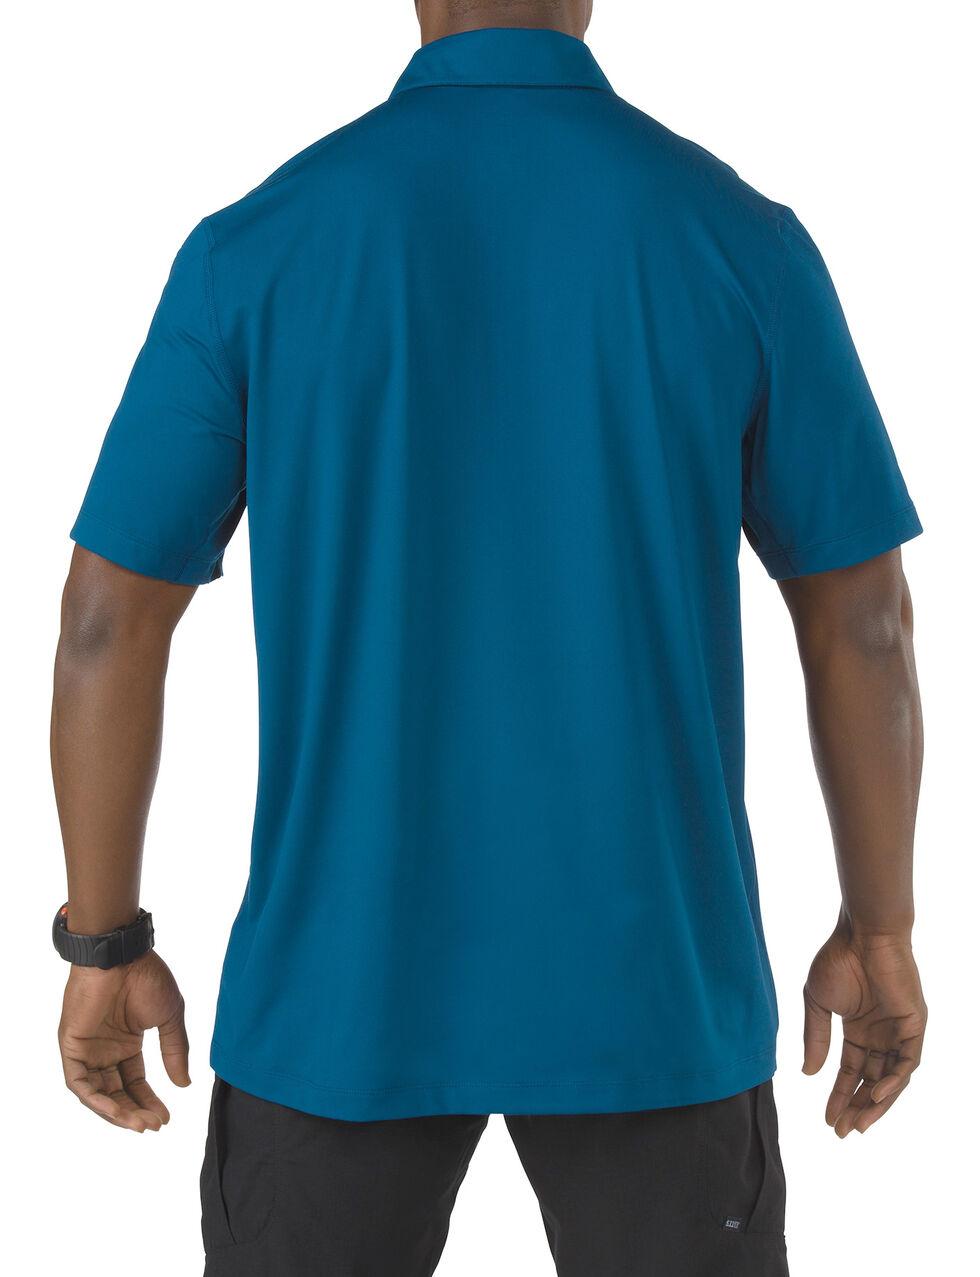 5.11 Tactical Odyssey Short Sleeve Polo Shirt, Blue, hi-res